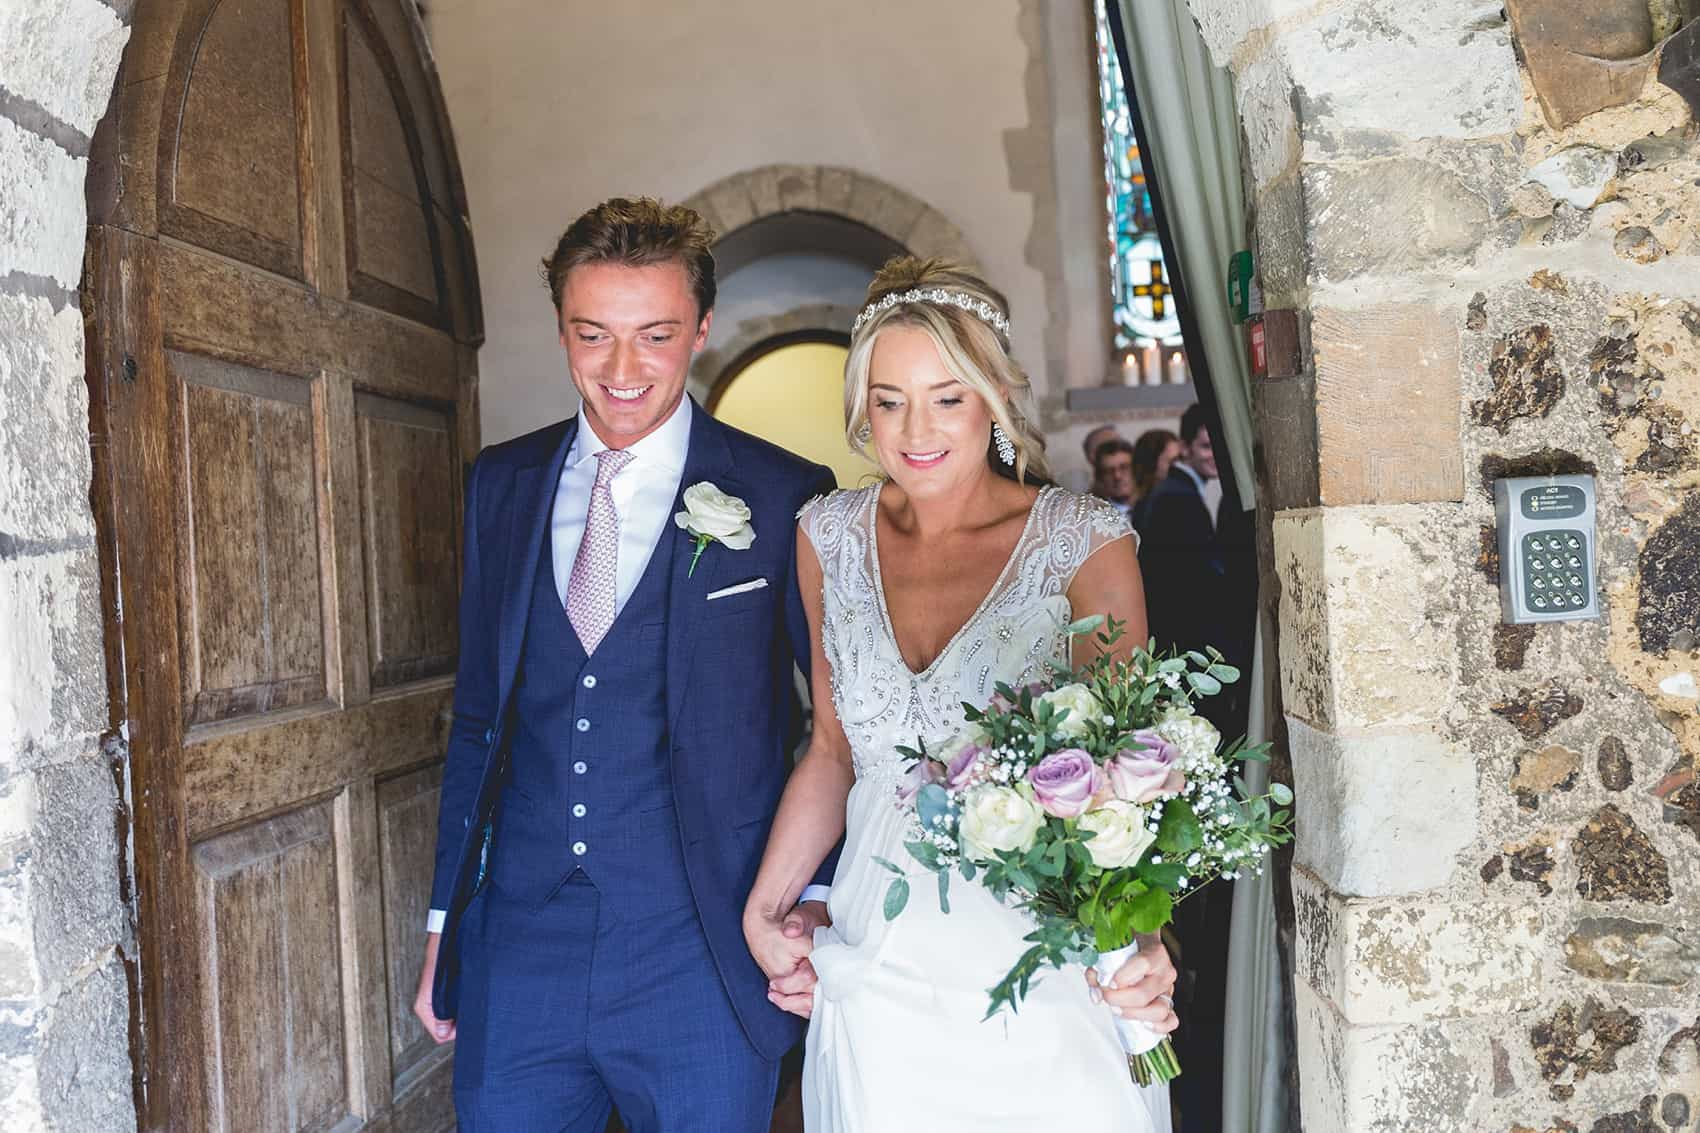 The Wedding of Sarah & Charlie – lngatestone Hall, Essex